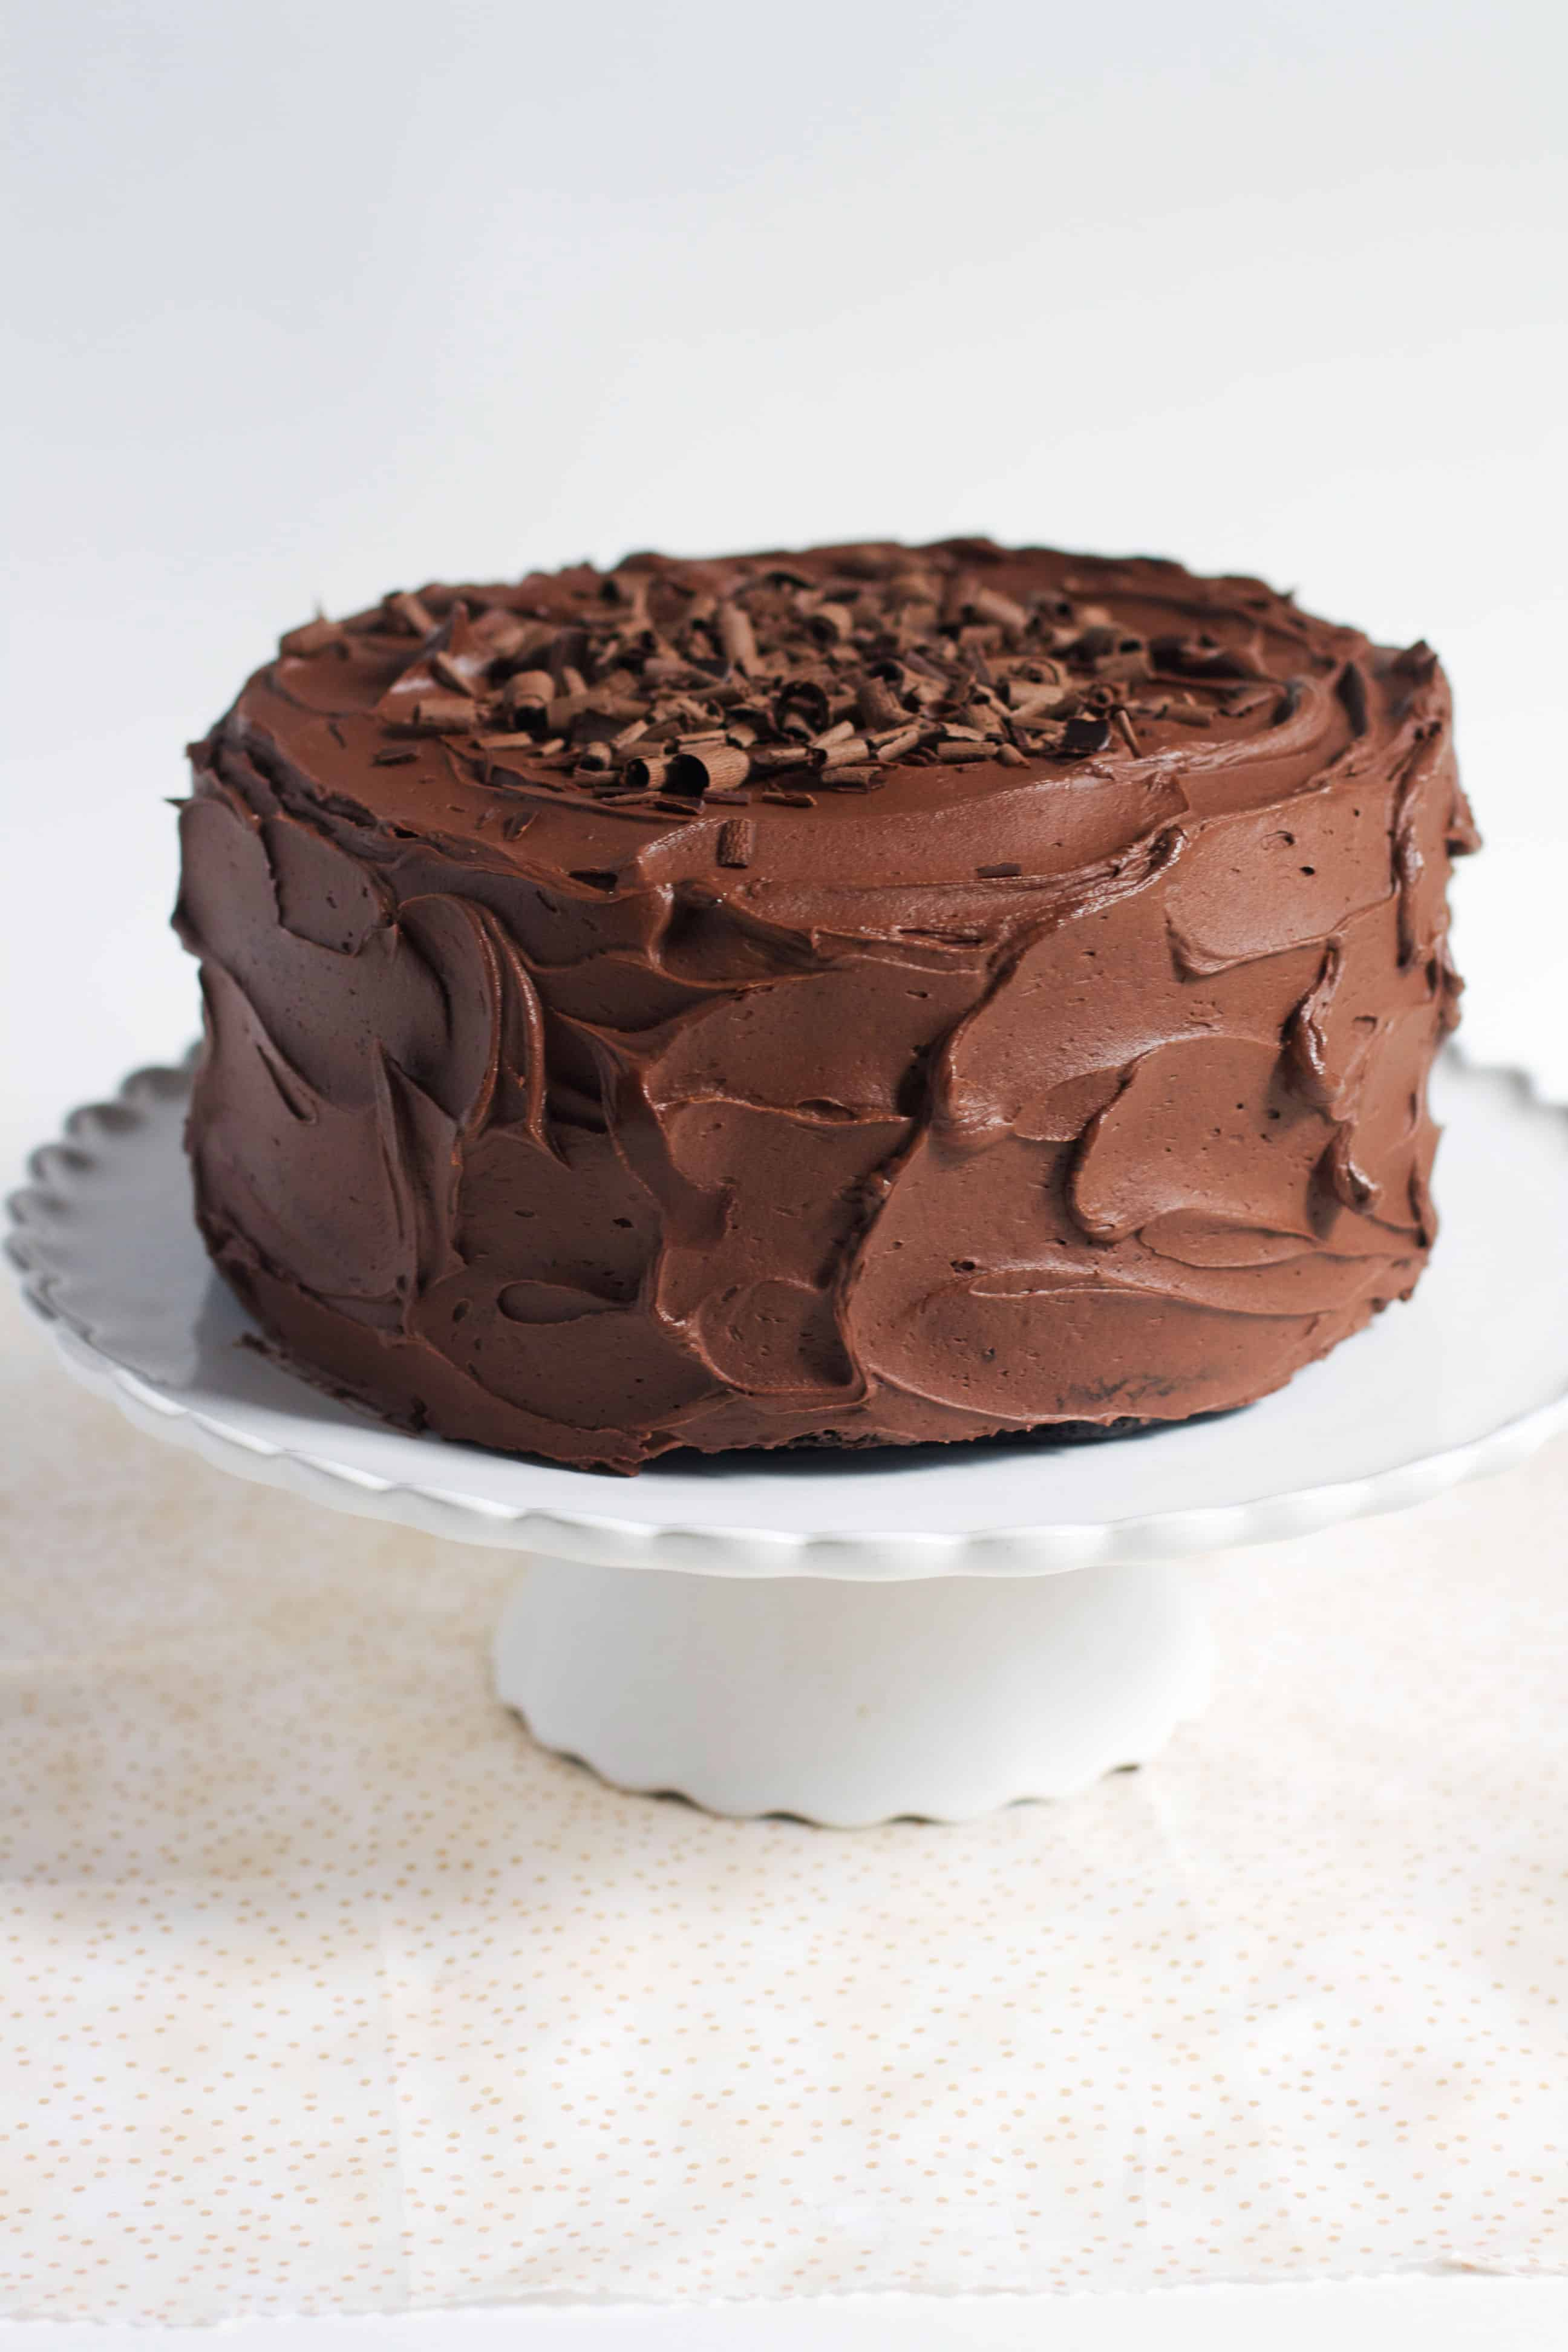 Classic One Bowl Chocolate Cake